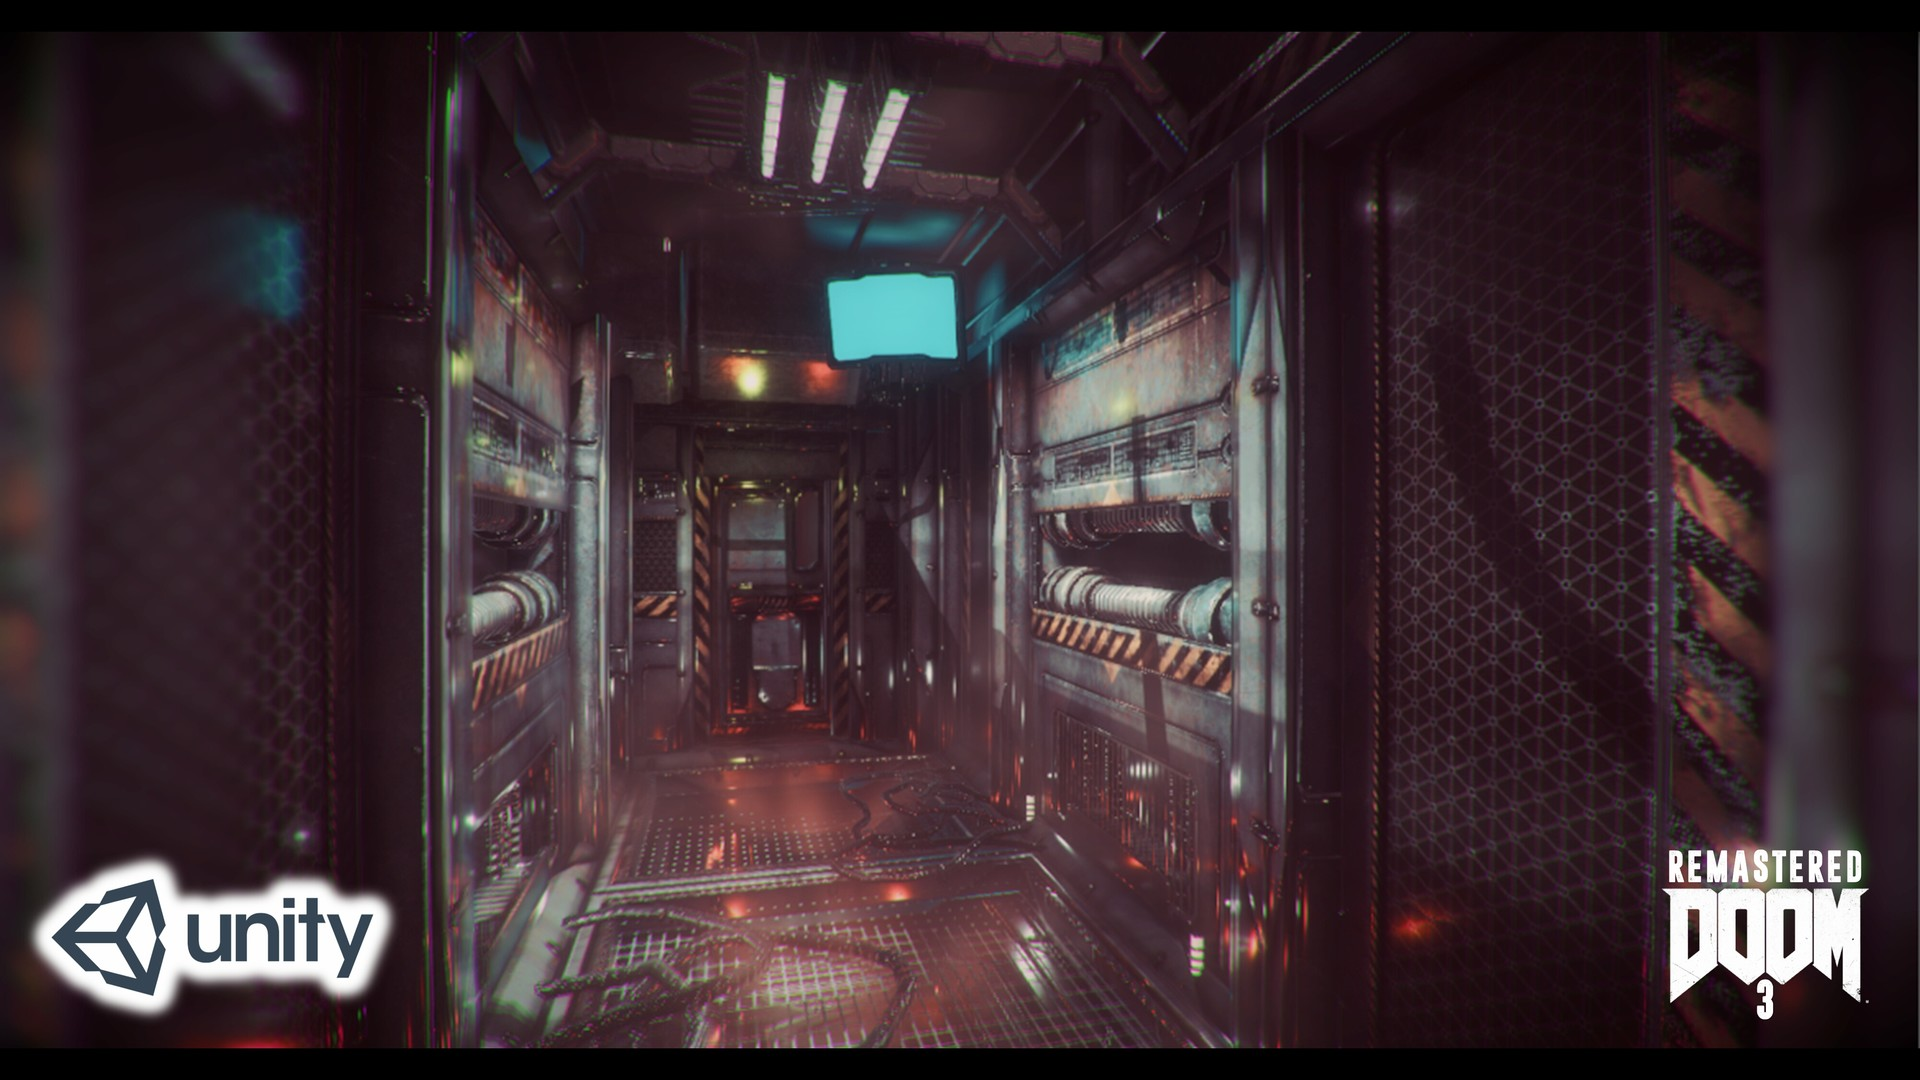 ArtStation - DOOM 3 Remastered Unity 5, Raihan Erviansyah